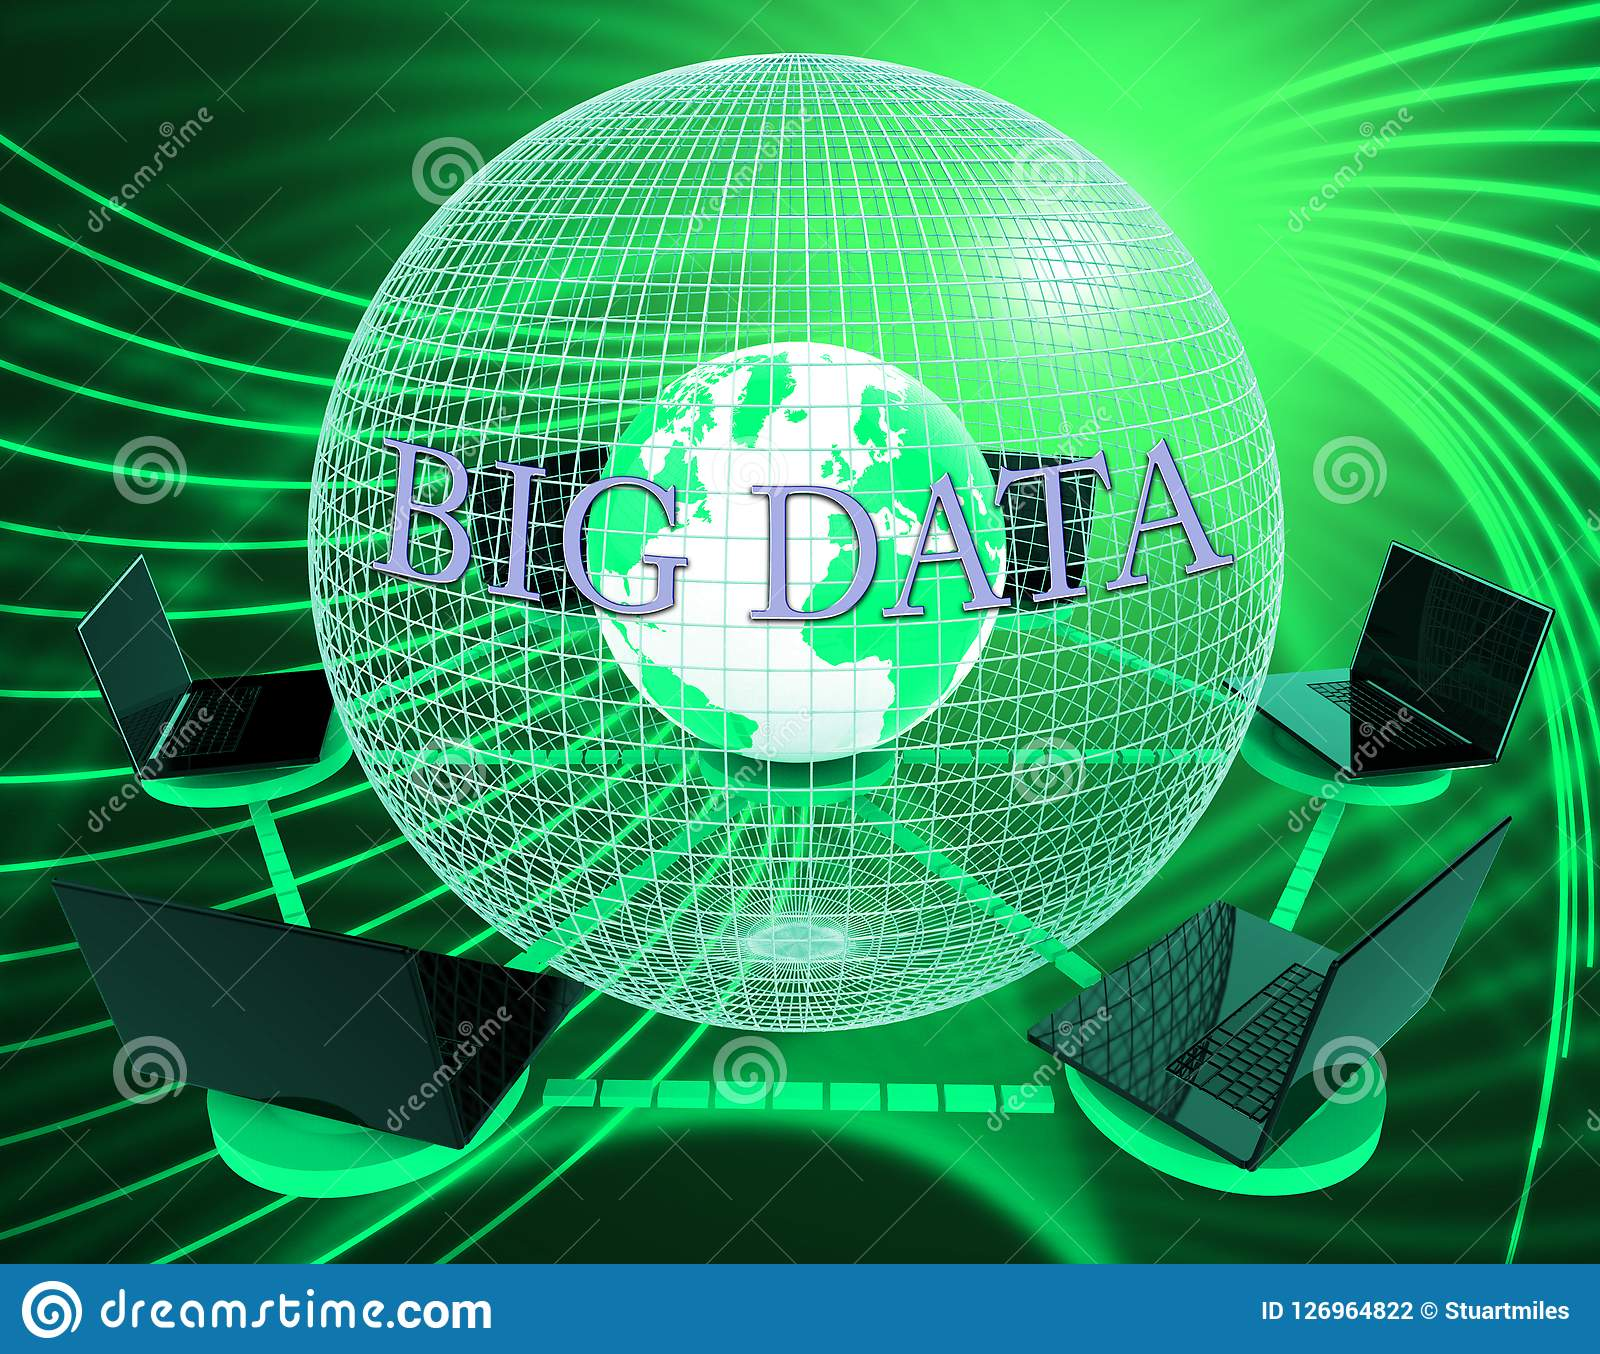 Bigdata Flow Stream Of Big Data 3d Illustration Stock Illustration Illustration Of Process Network 126964822